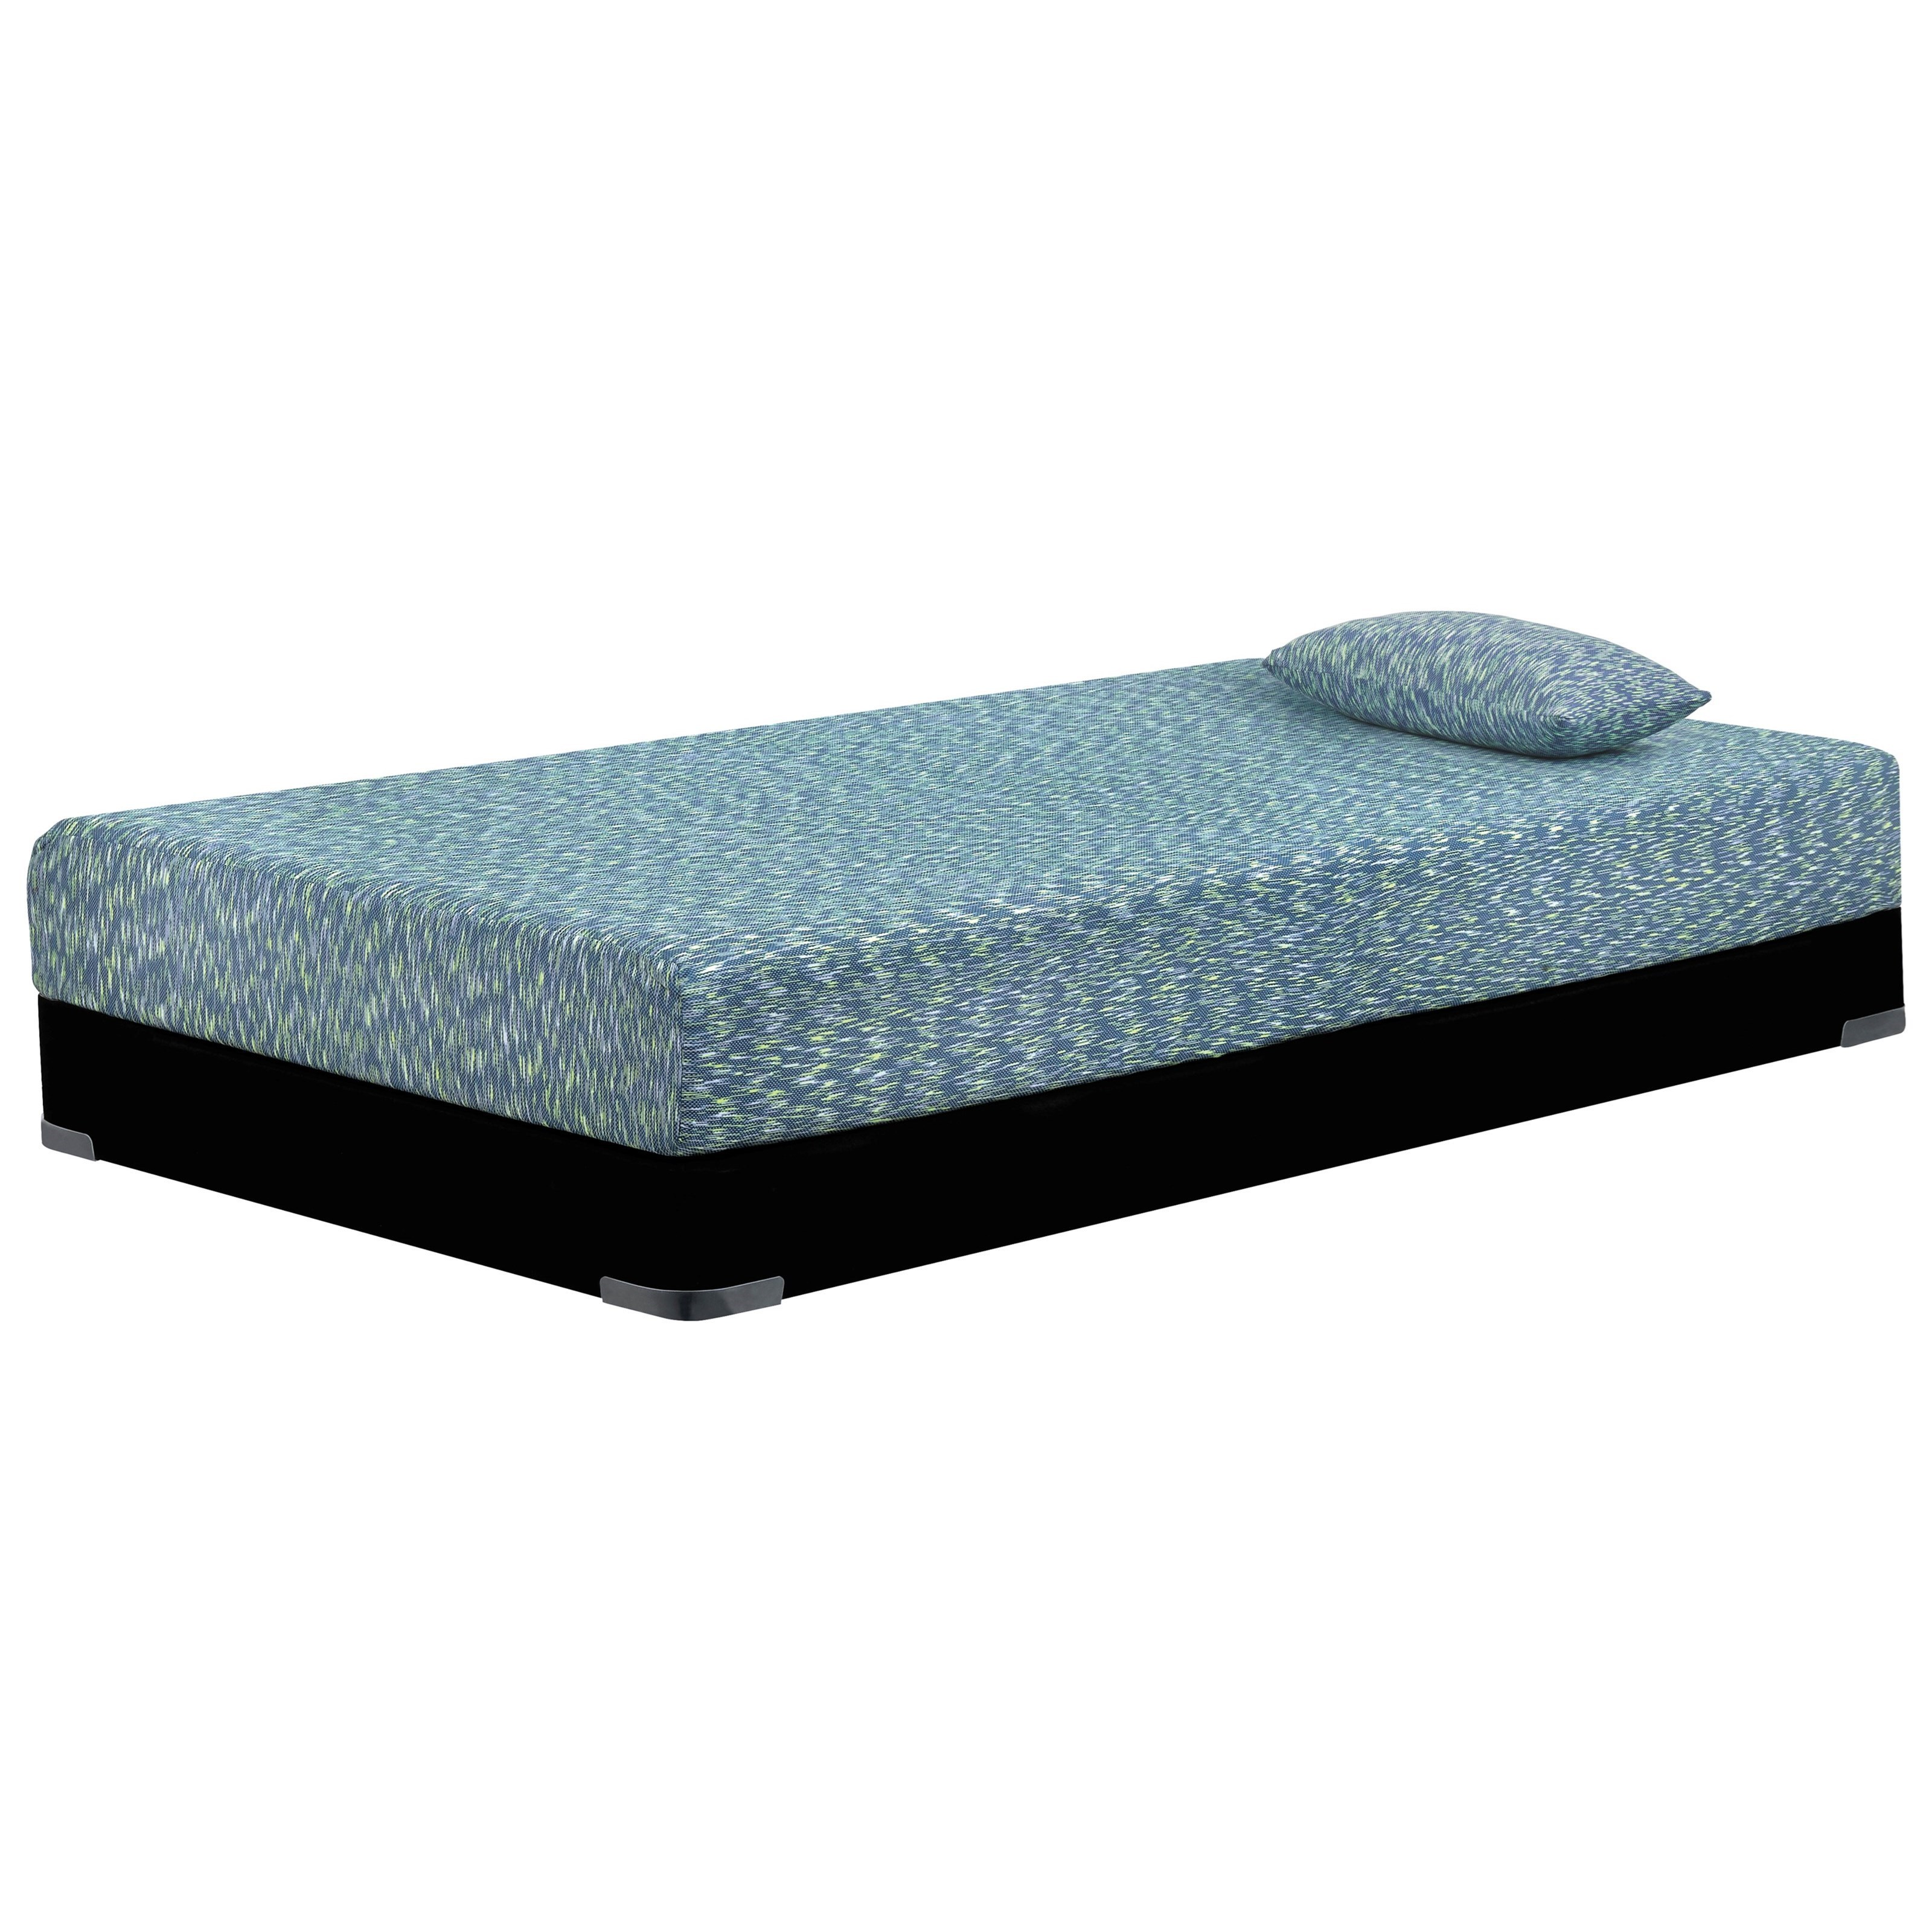 "iKidz Memory Foam Blue M658 Full 7"" Firm Blue Memory Foam Mattress Set by Sierra Sleep at Beds N Stuff"